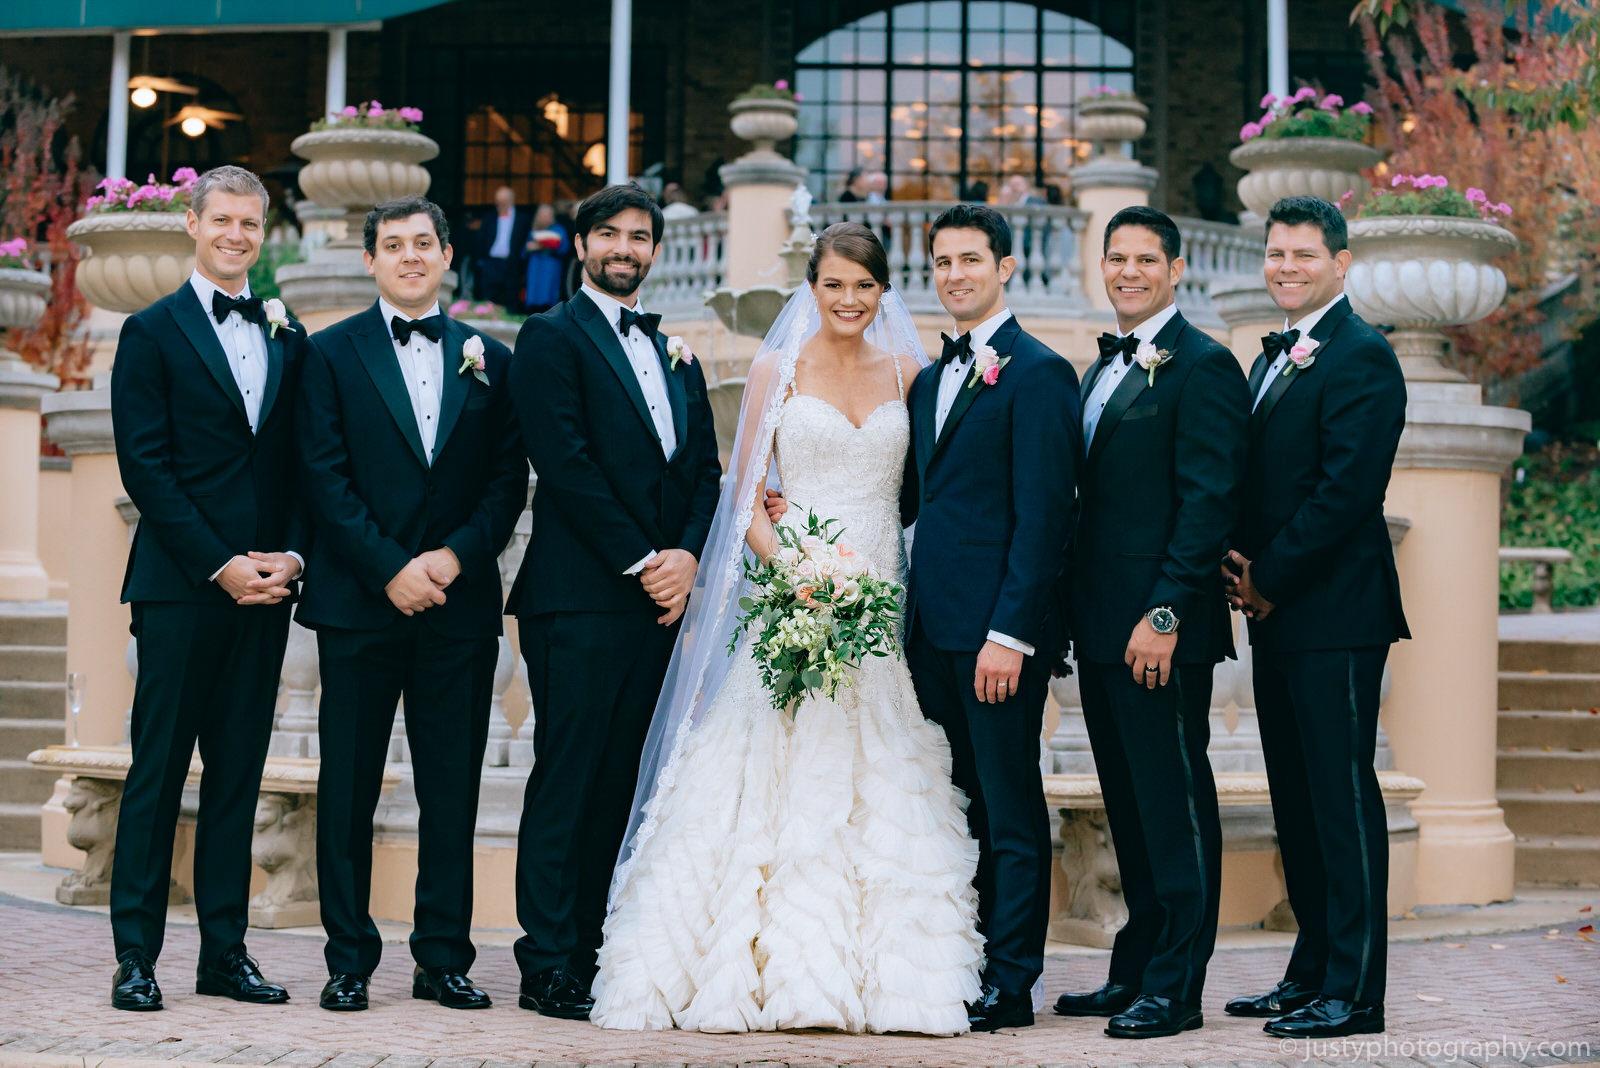 Omni Shoreham wedding photos-washington-dc-wedding-venues (132 of 171).jpg